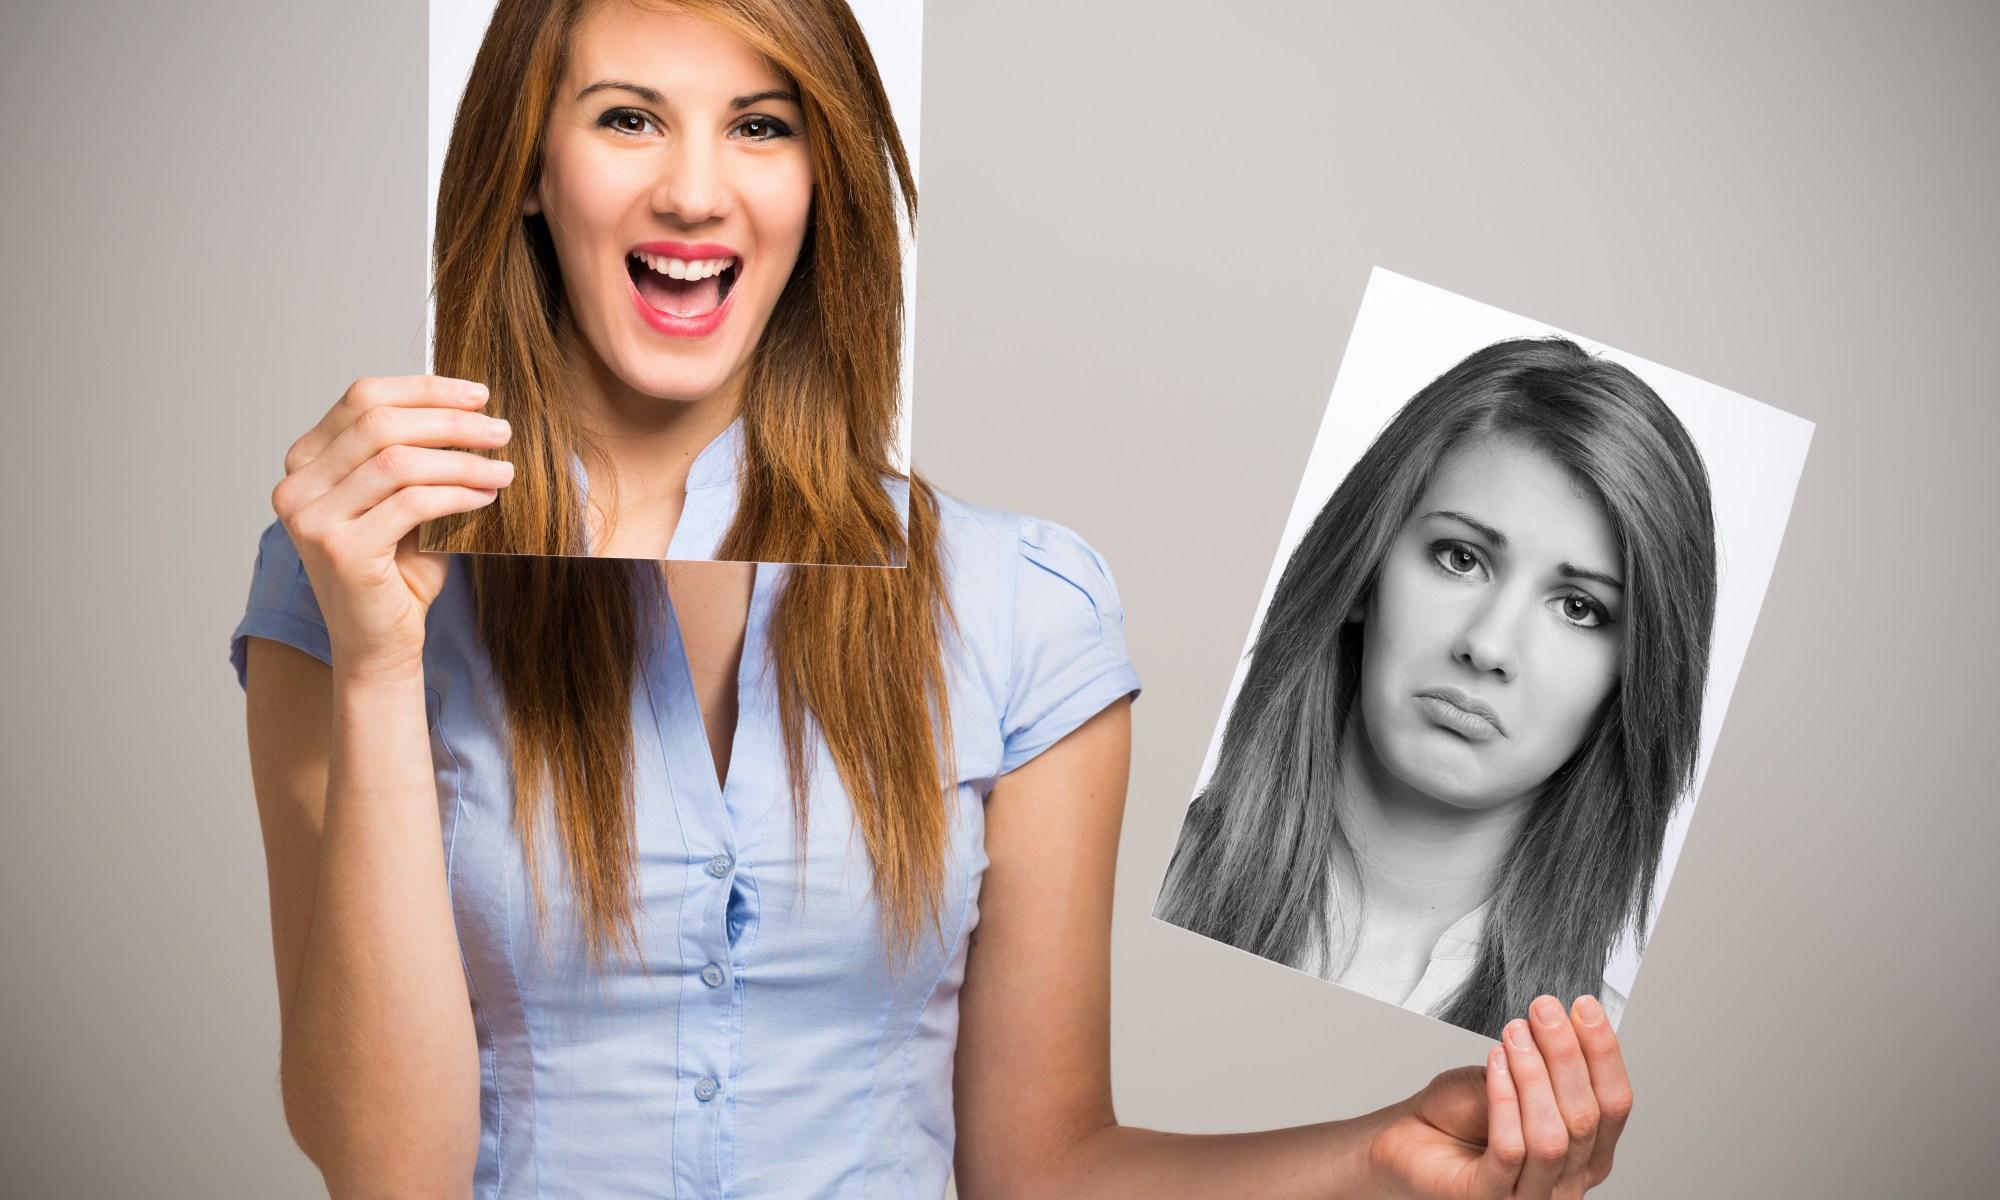 Happy vs. sad face